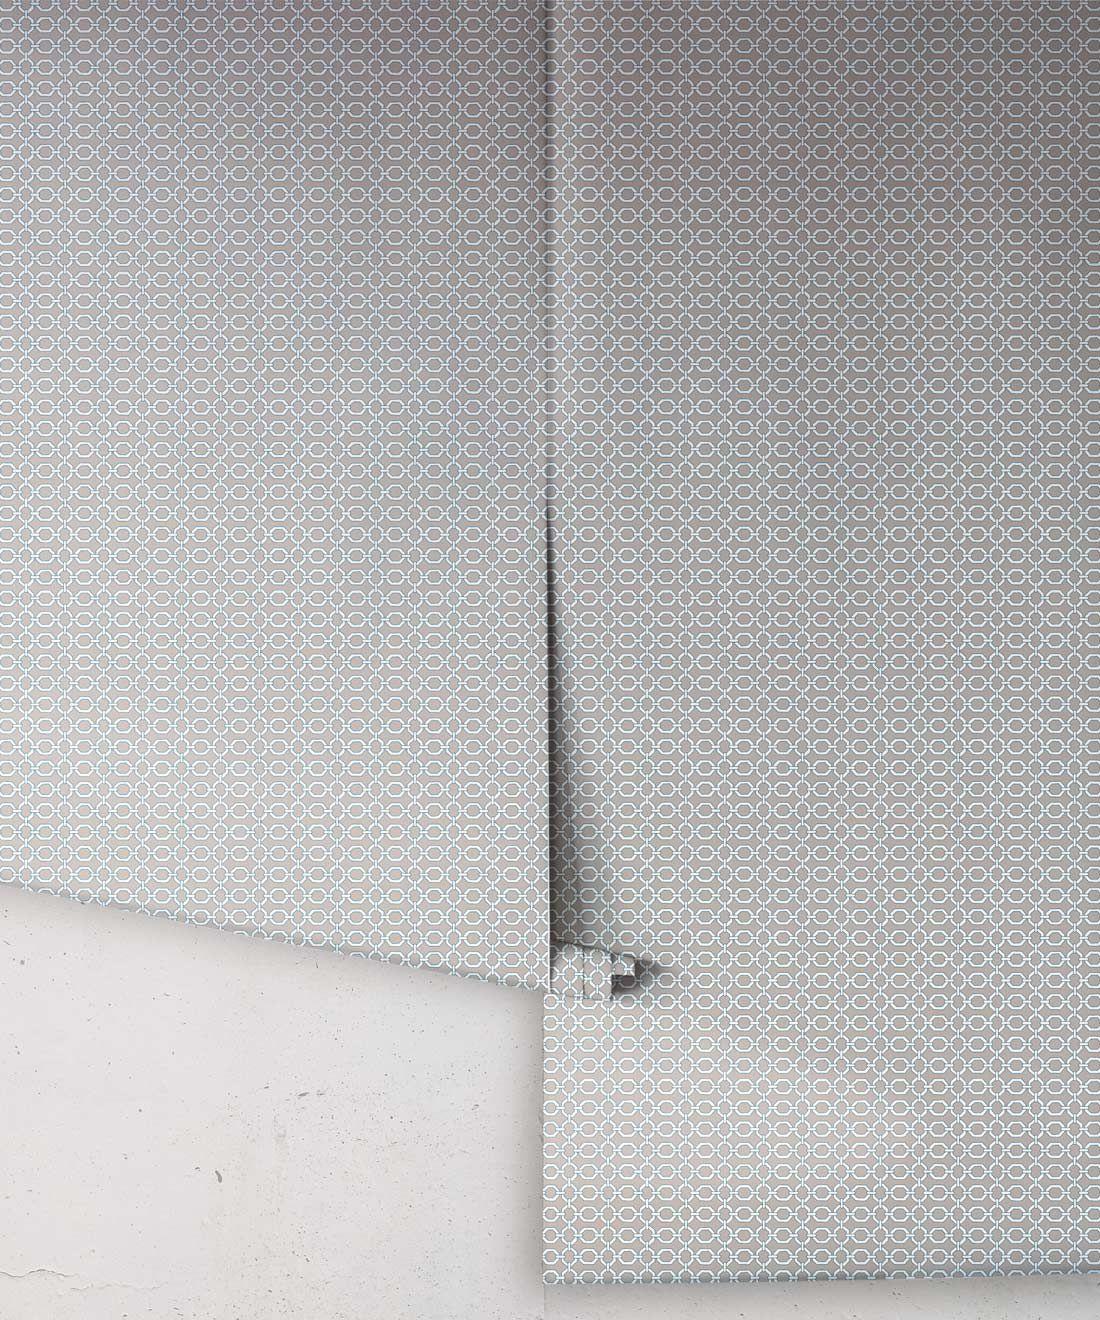 Ravello Wallpaper • Dianne Bergeron • Putty •Rolls